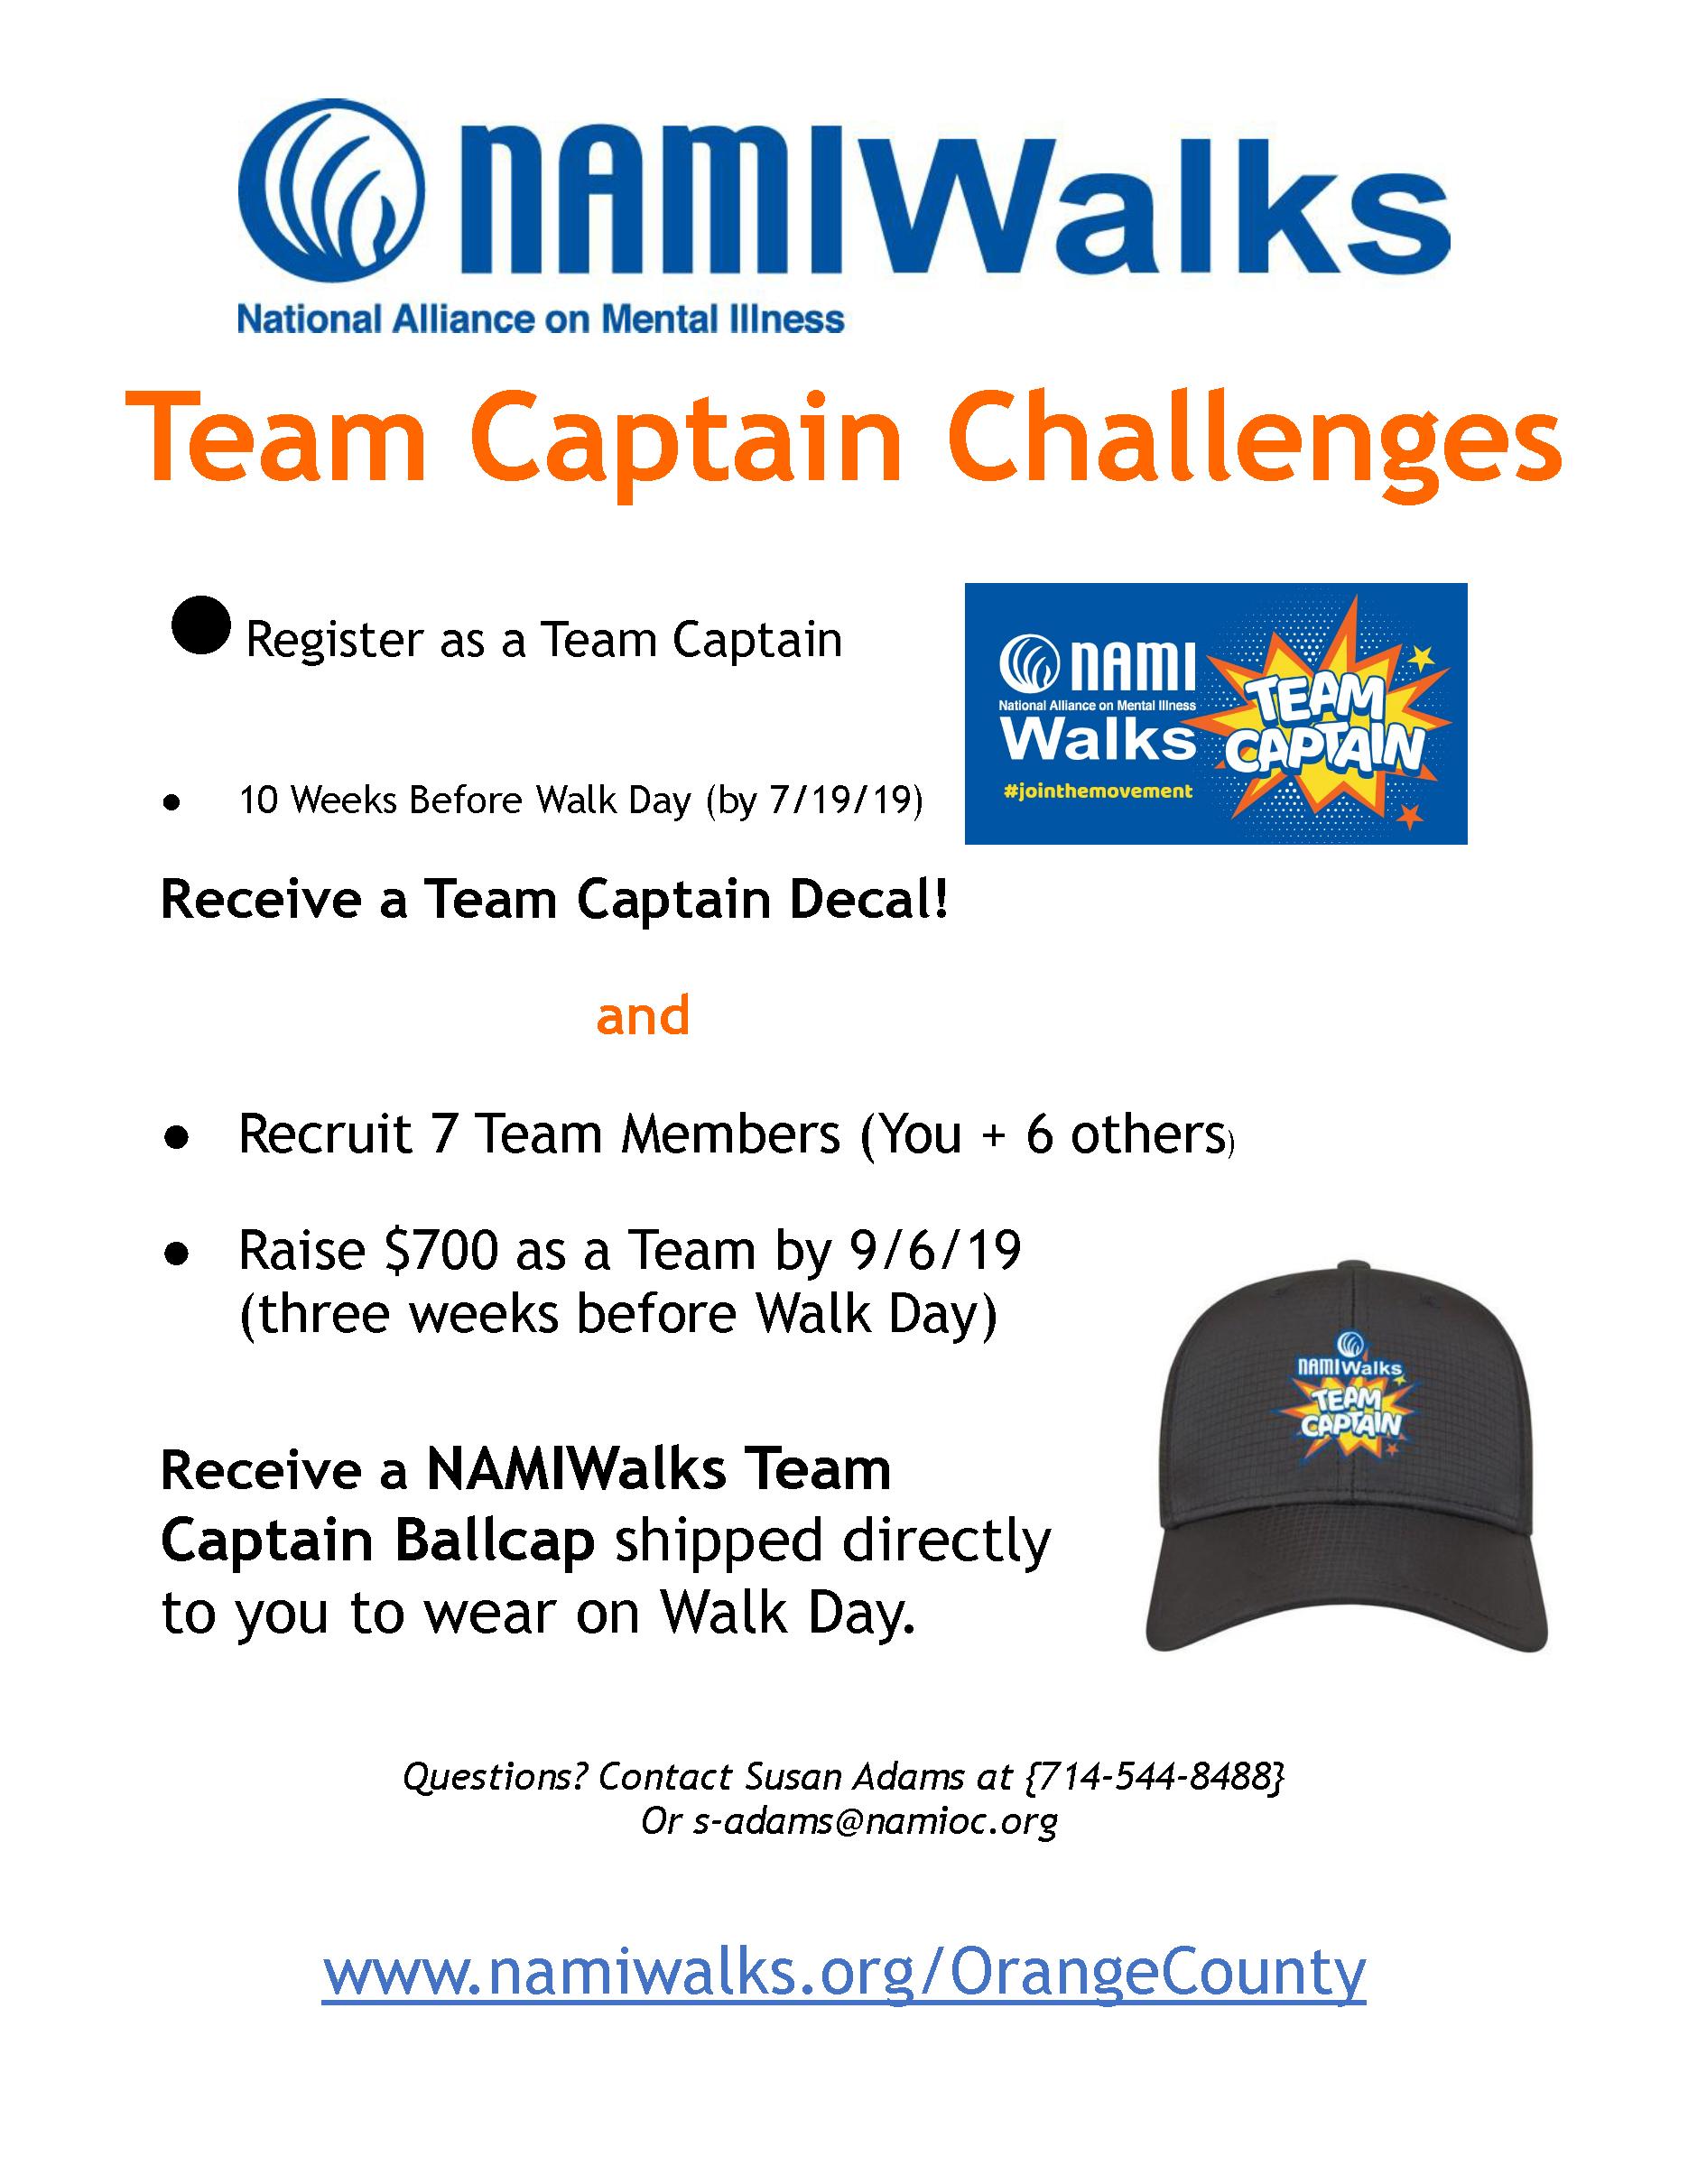 Team Captain Challenge Flyer 2019.png